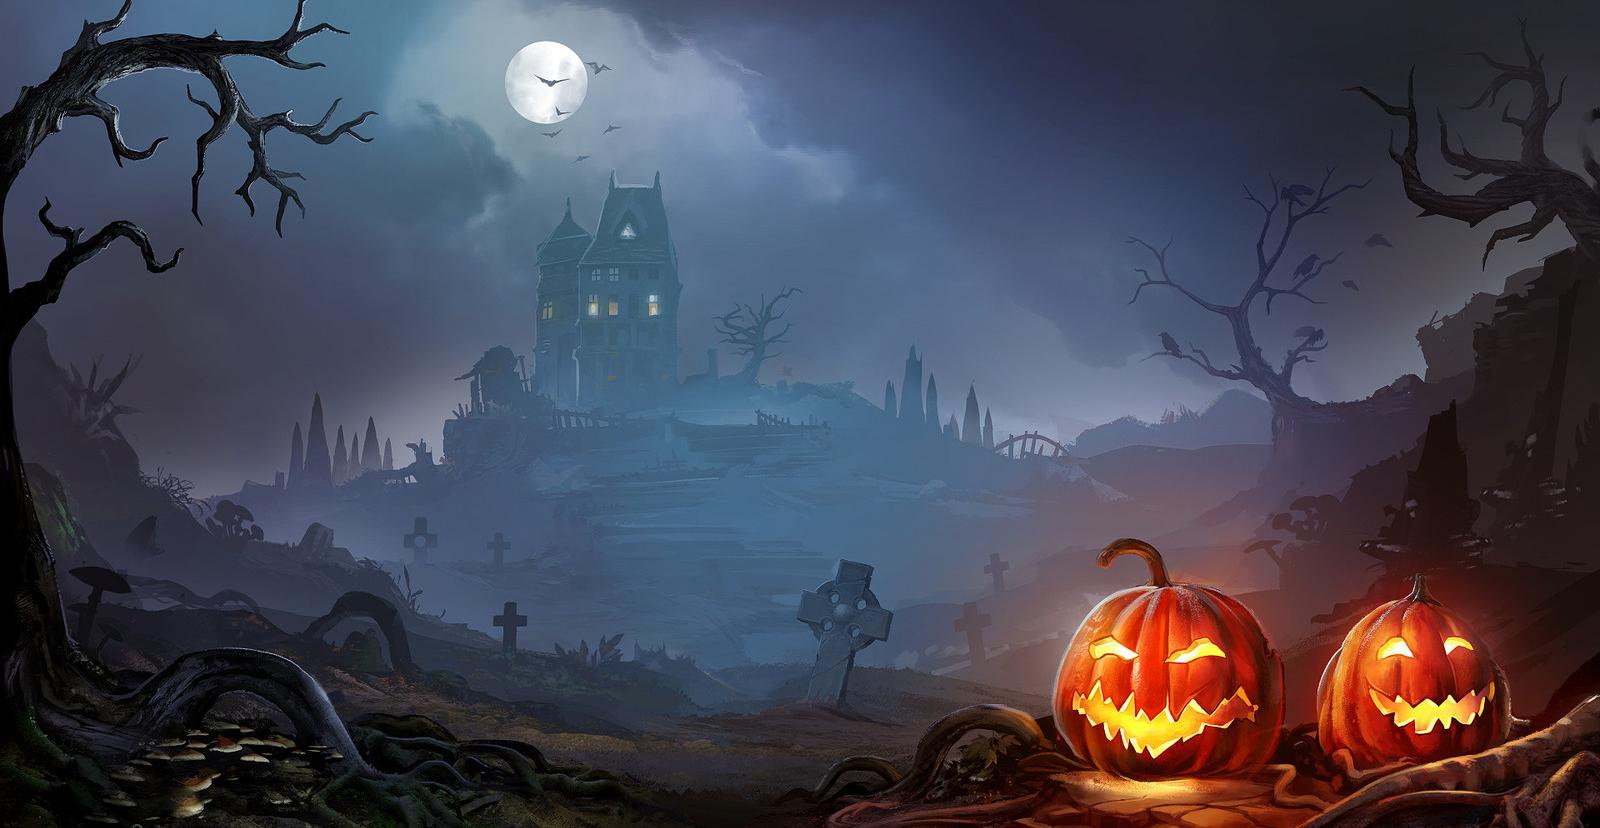 картинки фон хэллоуин этом разделе